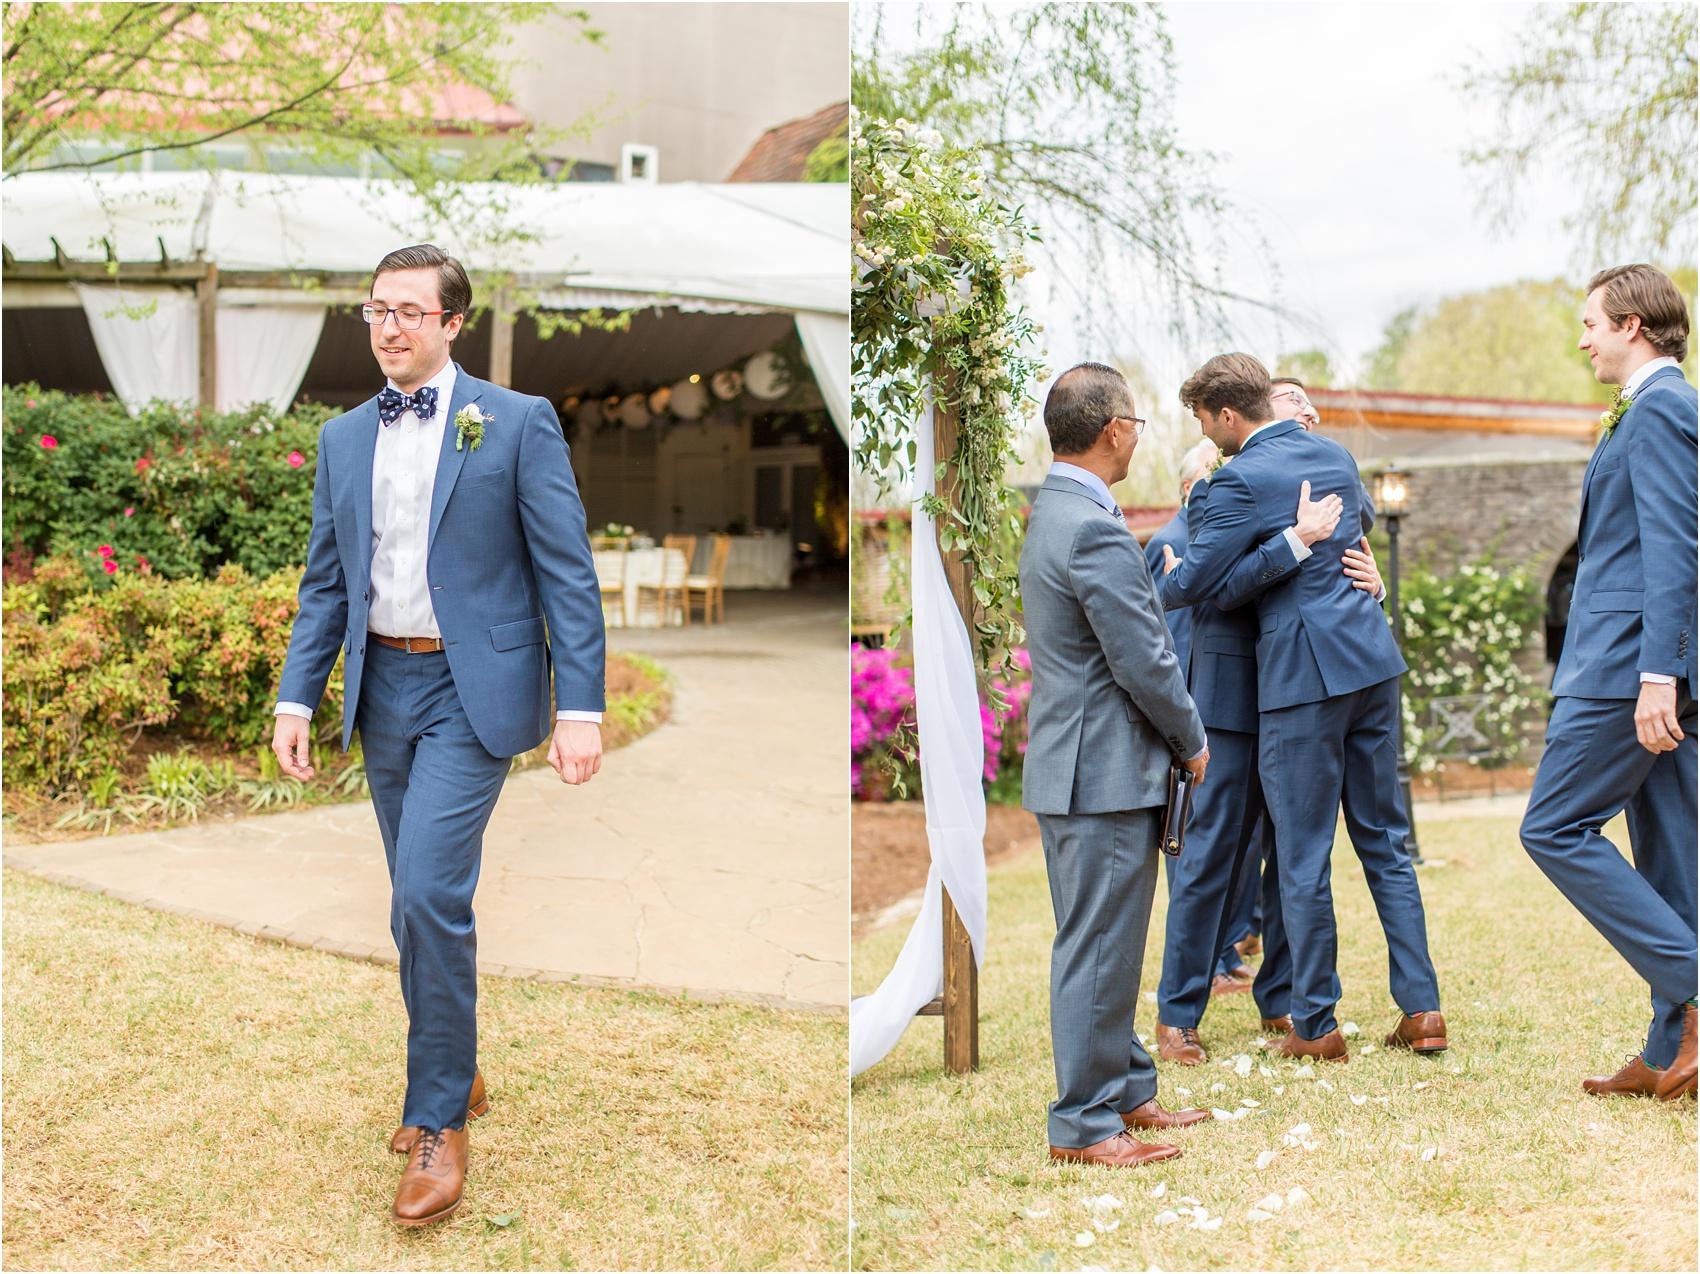 Savannah Eve Photography- Groseclose Wedding- Blog-47.jpg